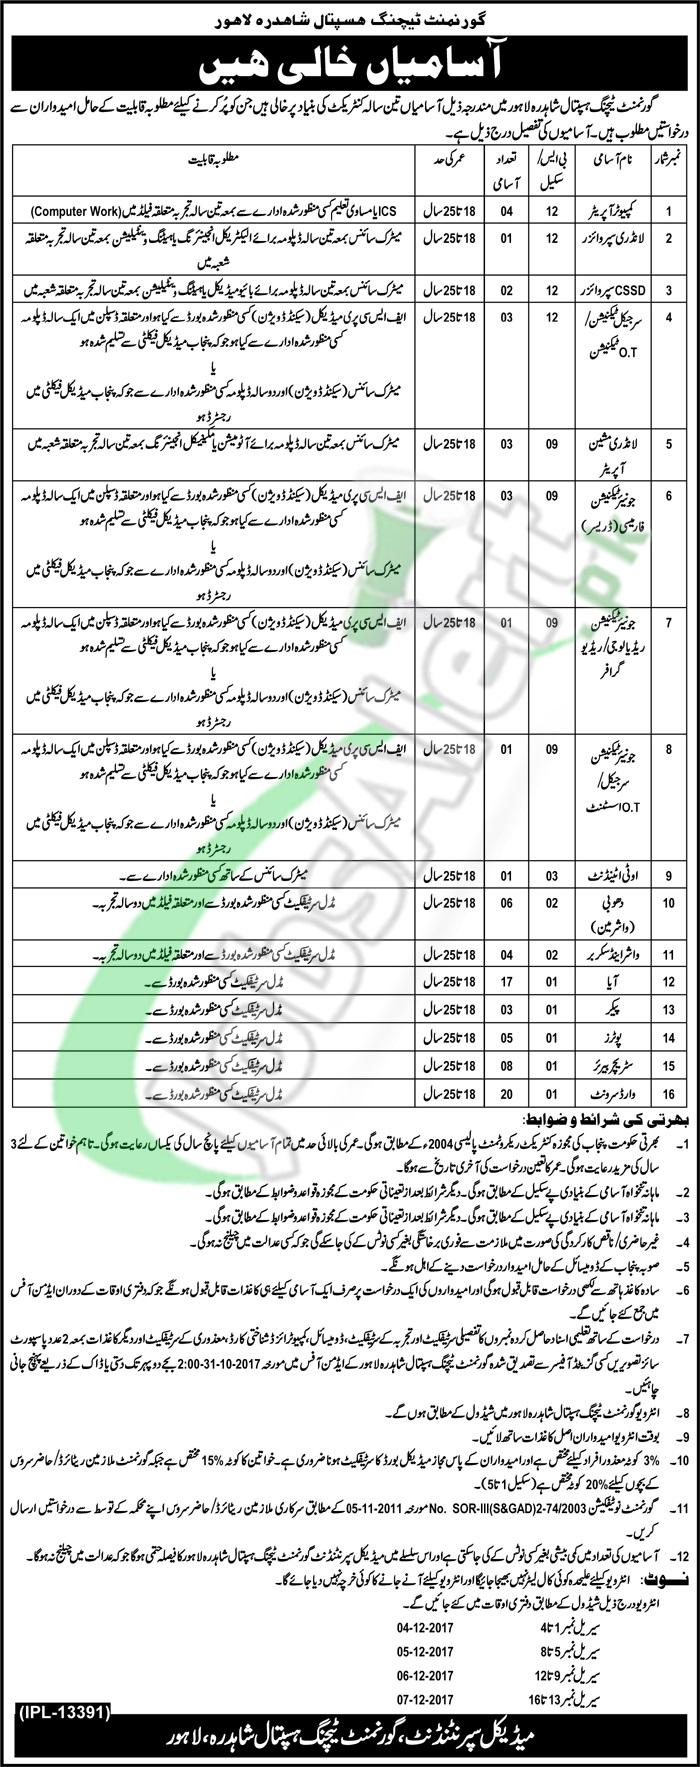 Government Teaching Hospital Shahdara Lahore Jobs